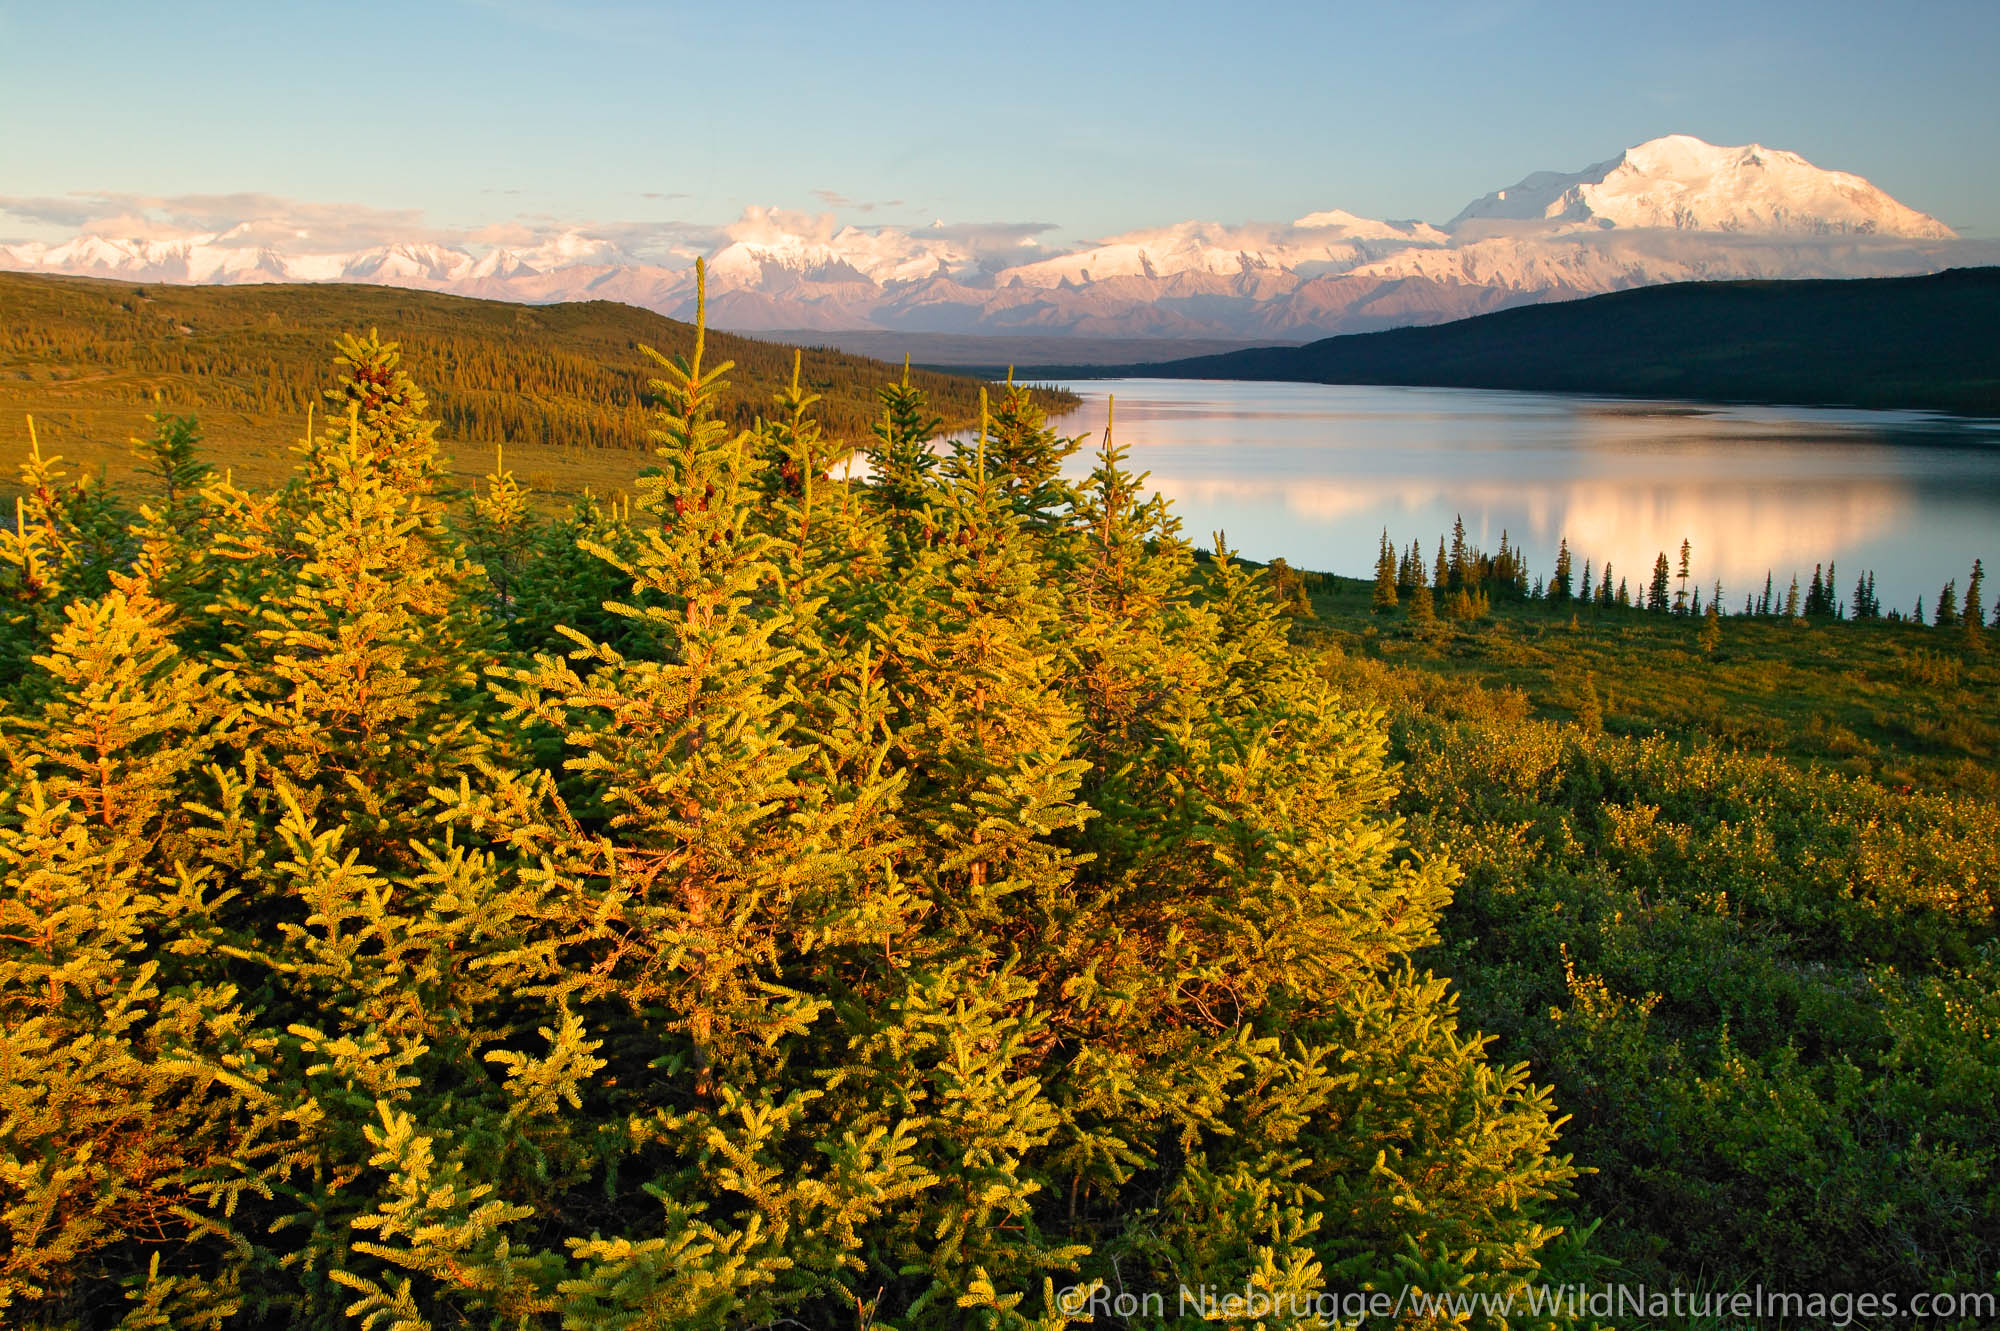 Mt. McKinley and Wonder Lake from Blueberry Hill, Denali National Park, Alaska.